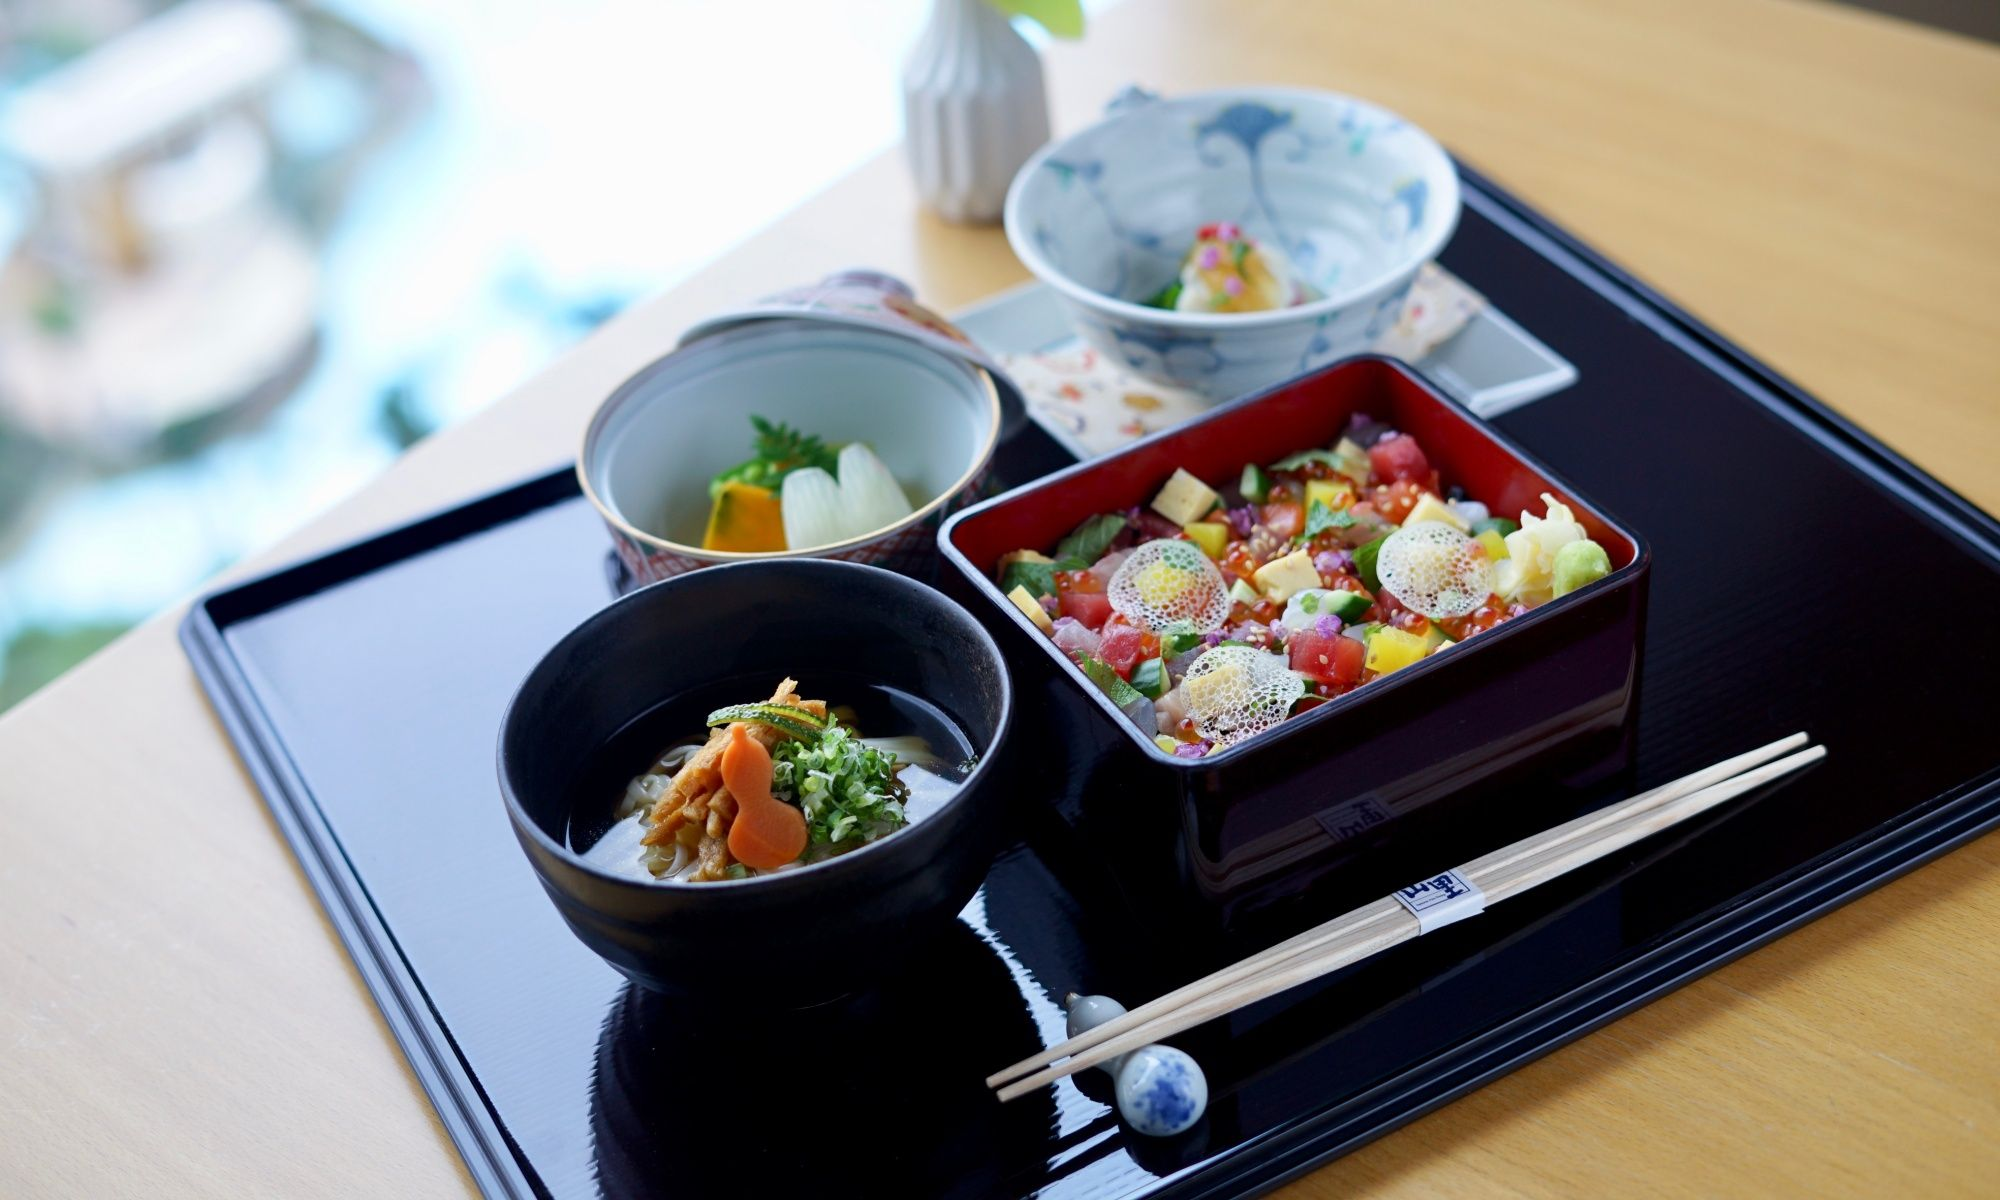 Yamazato Presents New Tanabata Gozen Lunch Menu